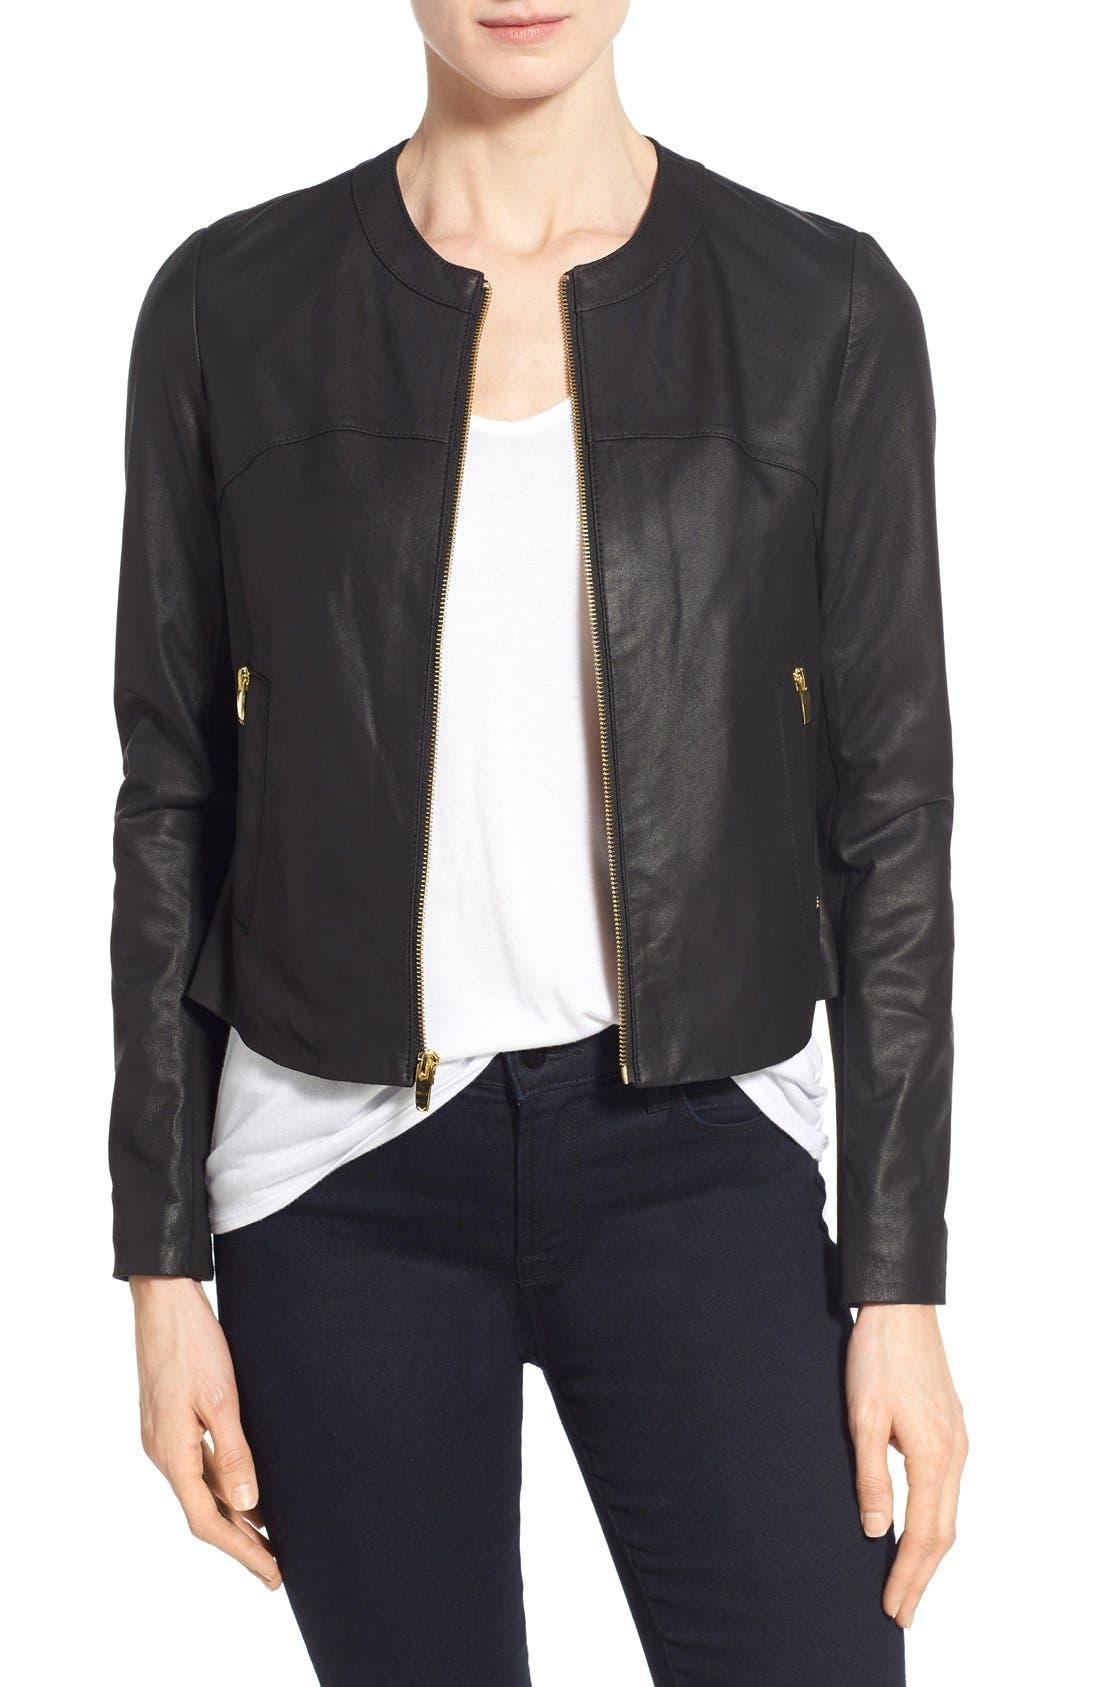 Main Image - Via Spiga Lambskin Leather & Knit Zip Front Collarless Jacket